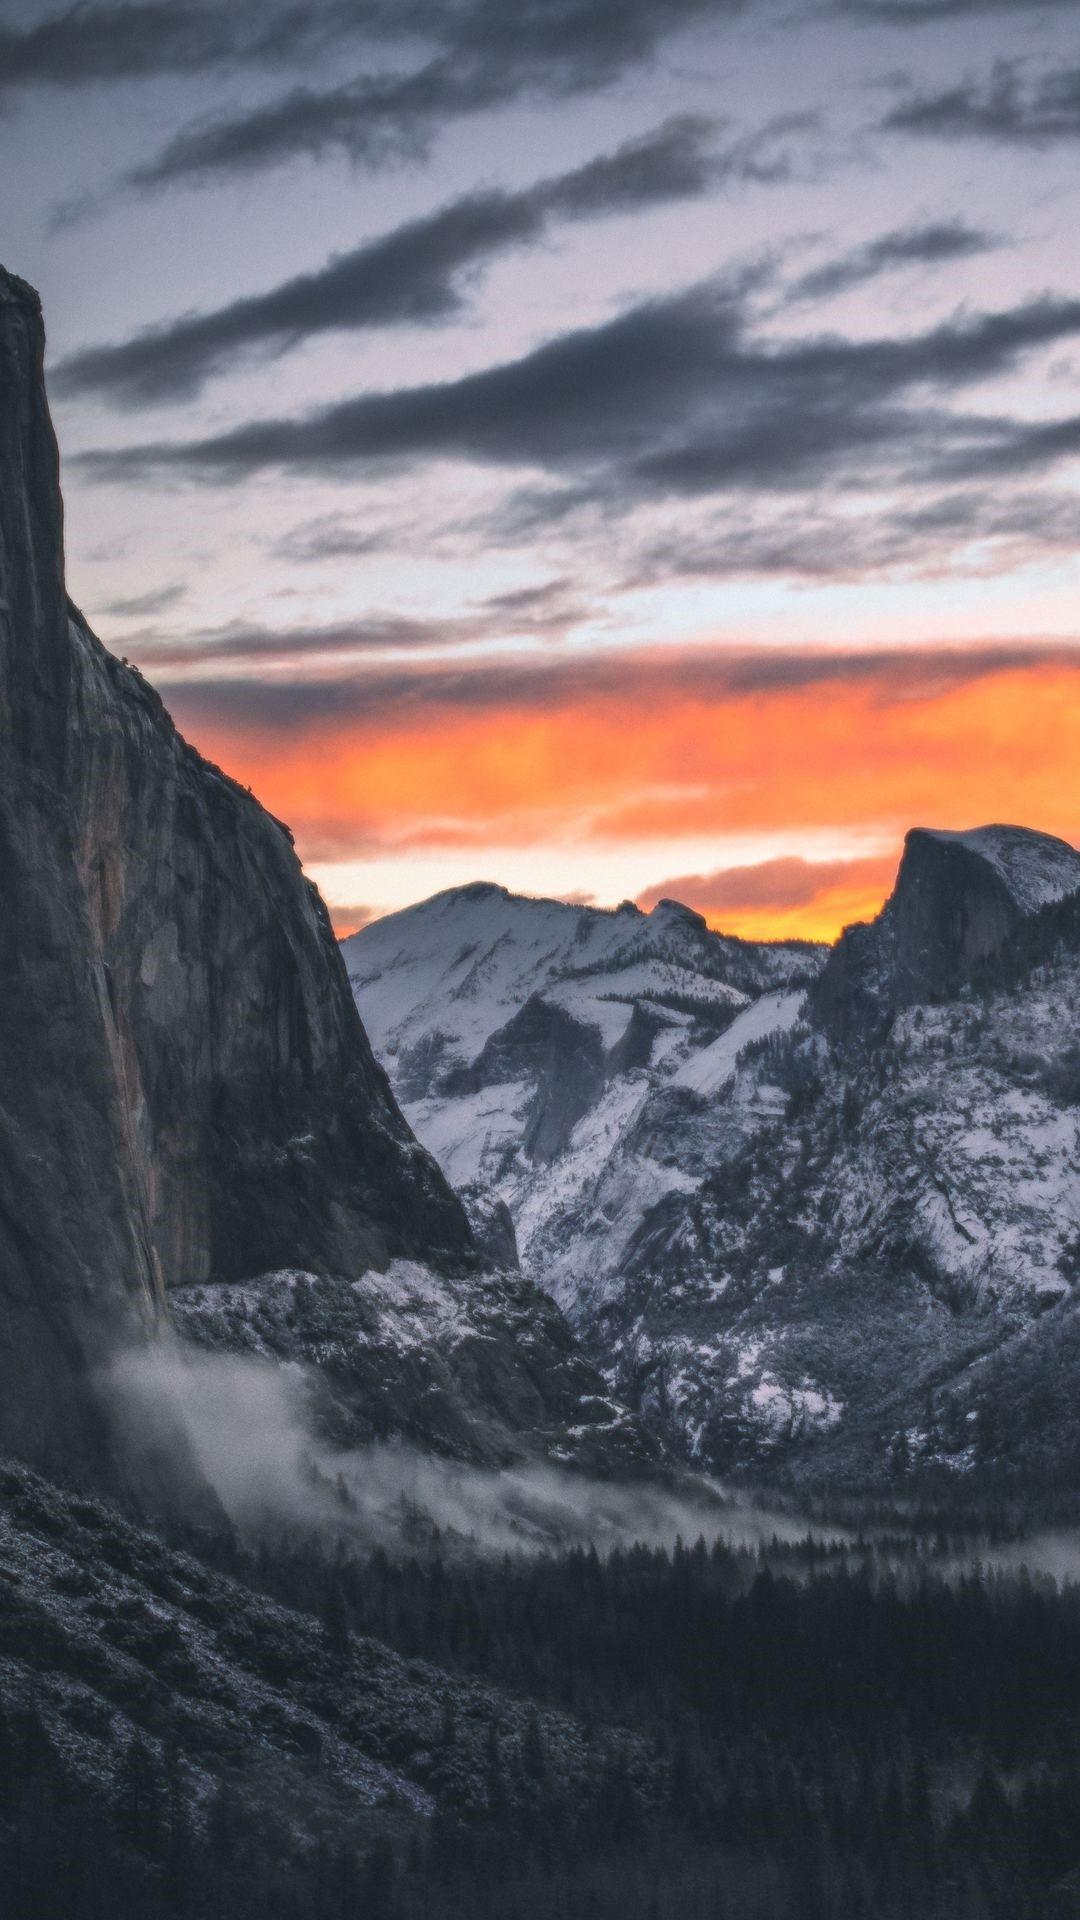 Mountain iphone 6s plus wallpaper